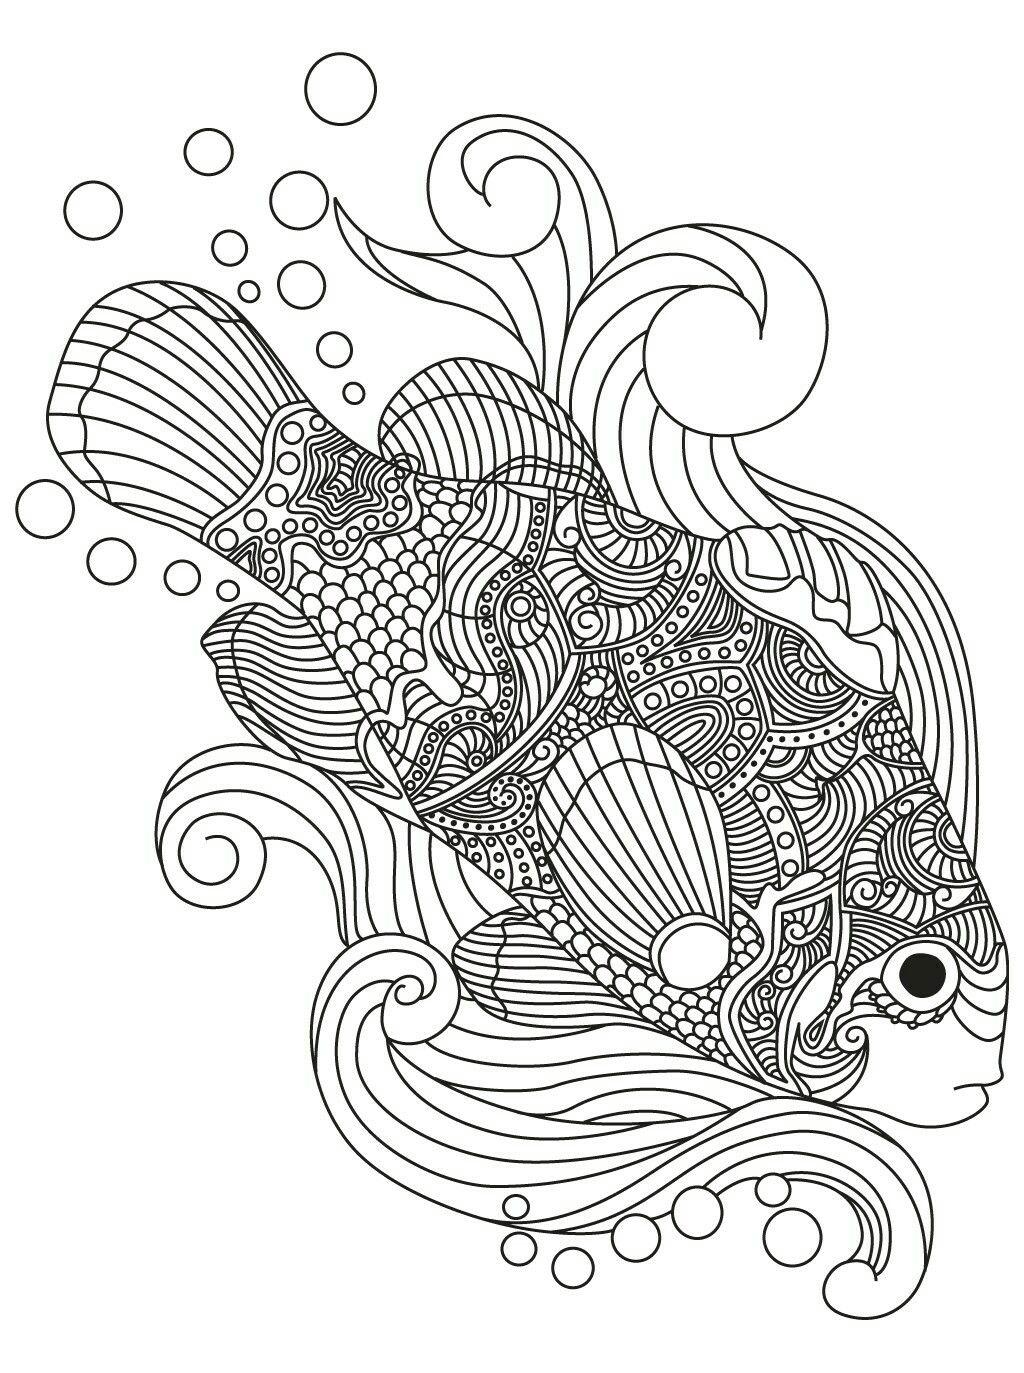 Pin by MarischКа Korepina on Морские обитатели | Pinterest